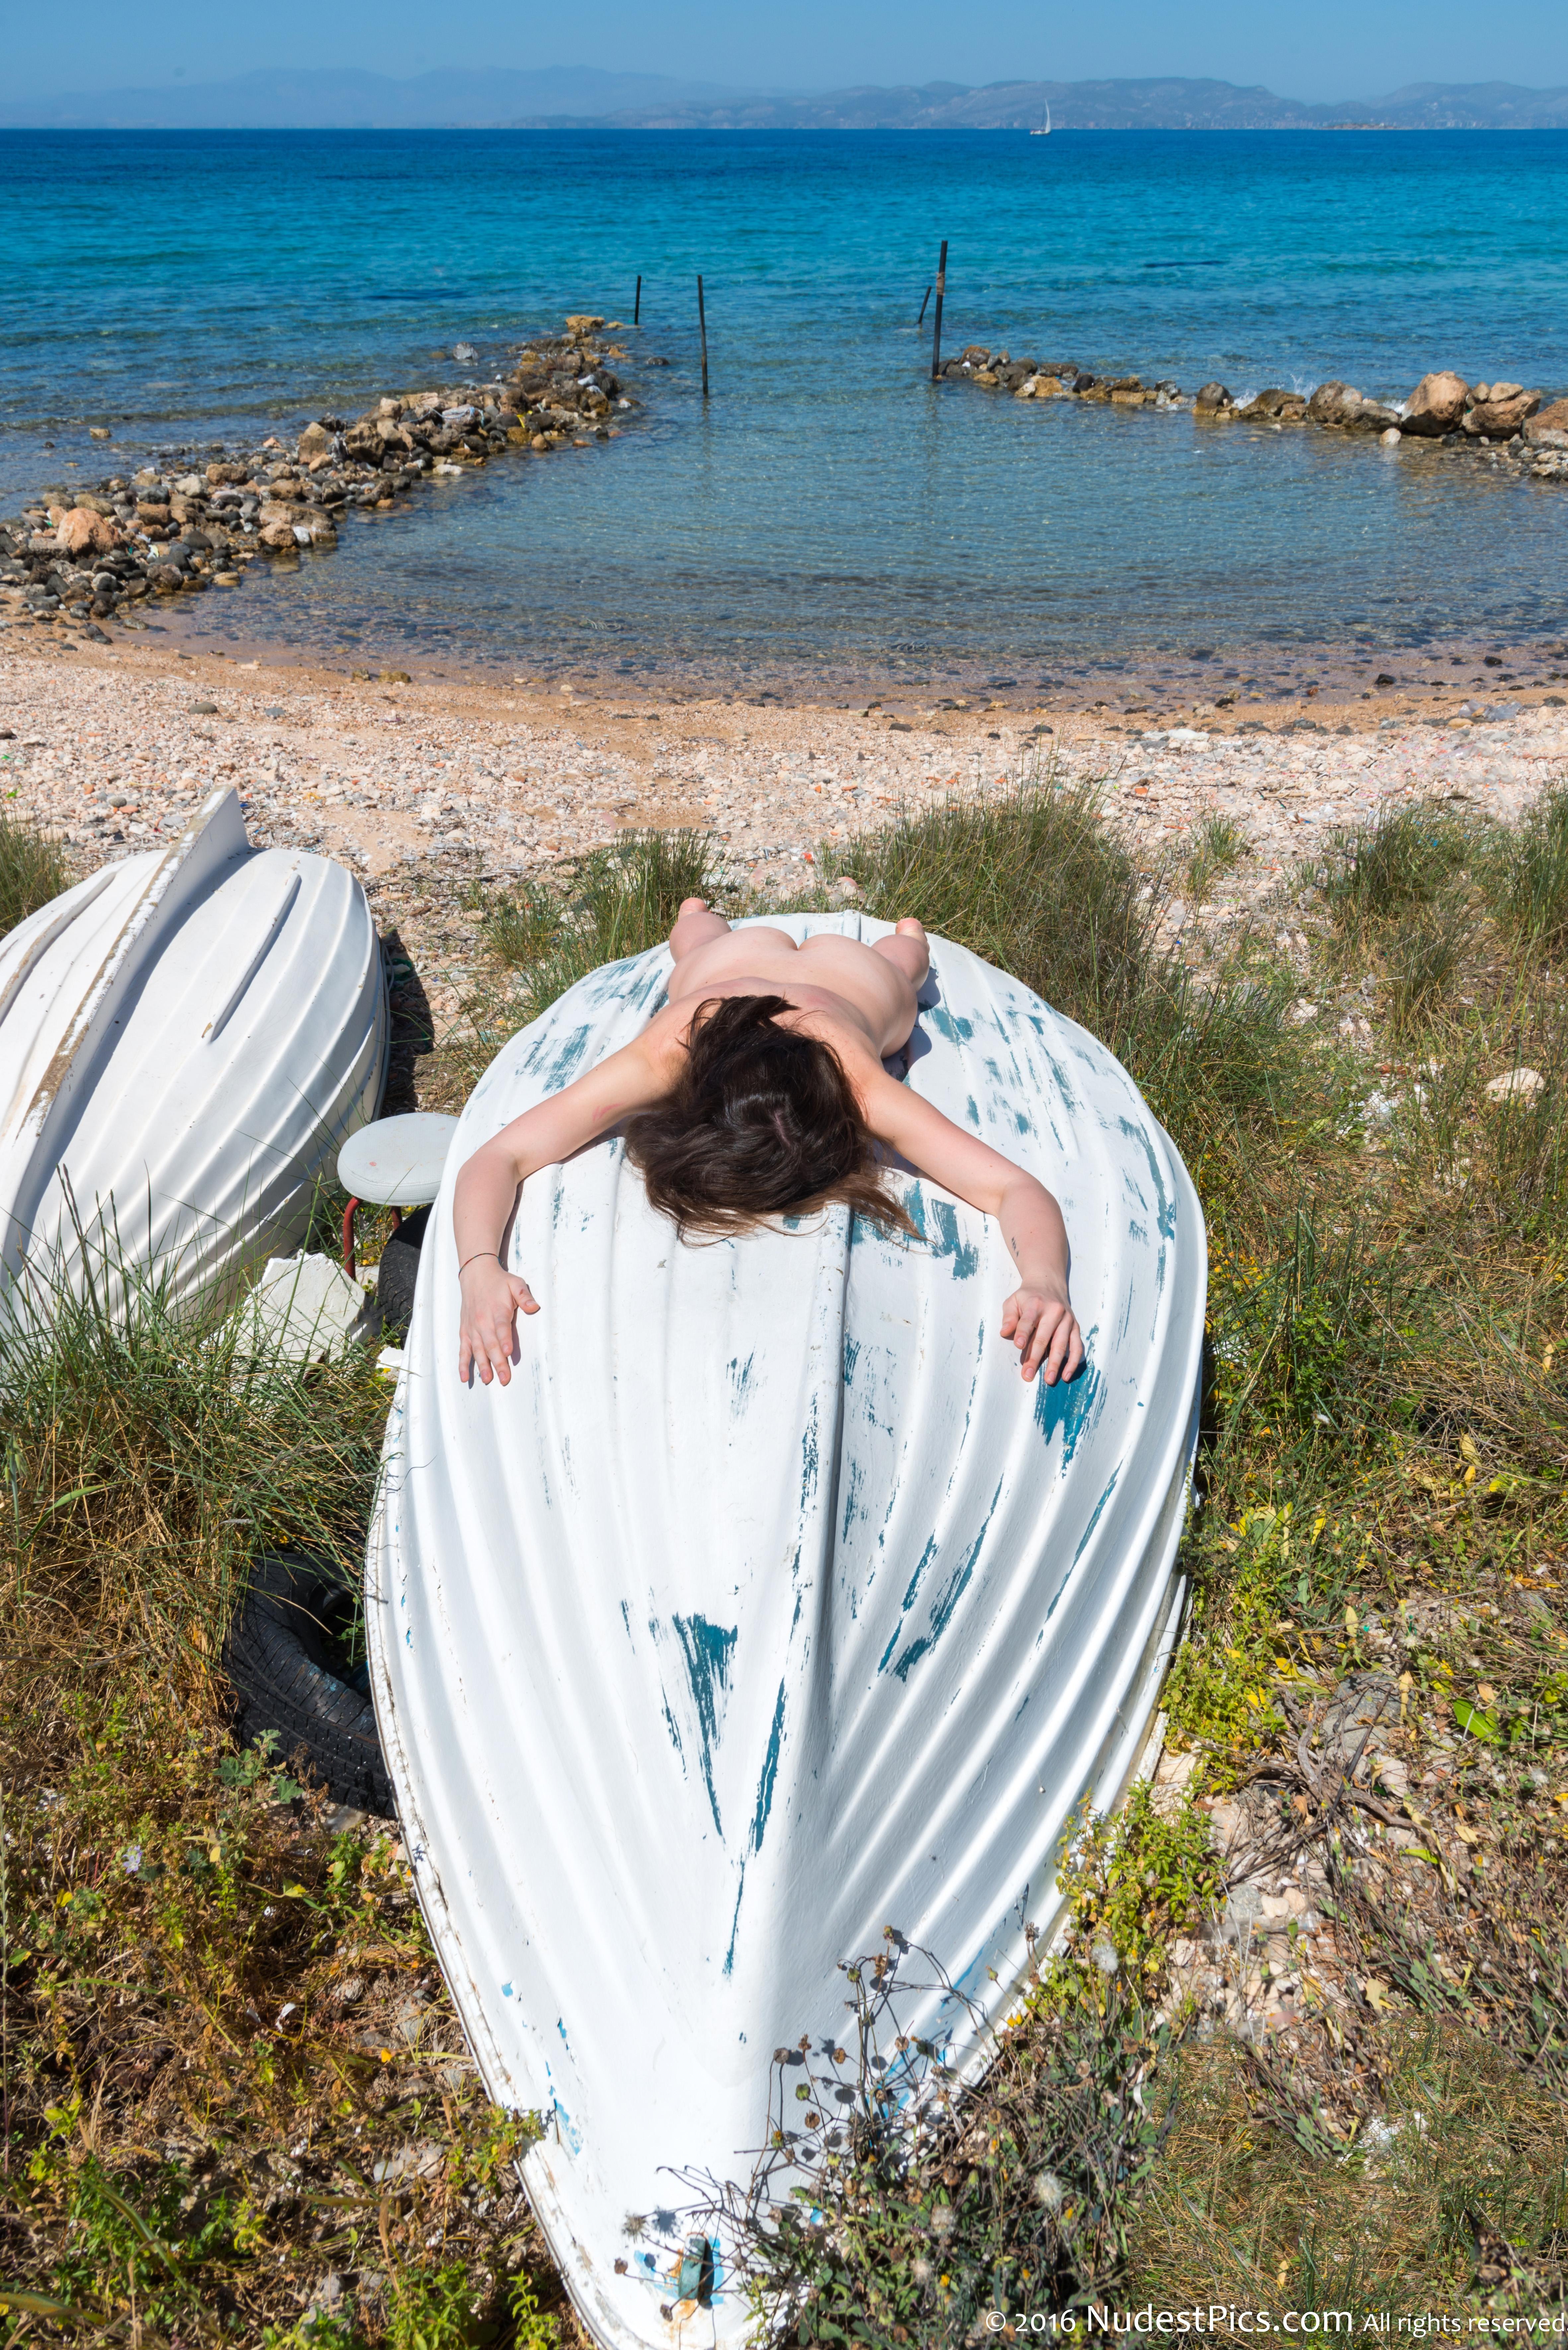 Nudist Woman Sunbathing on Boat at Seaside